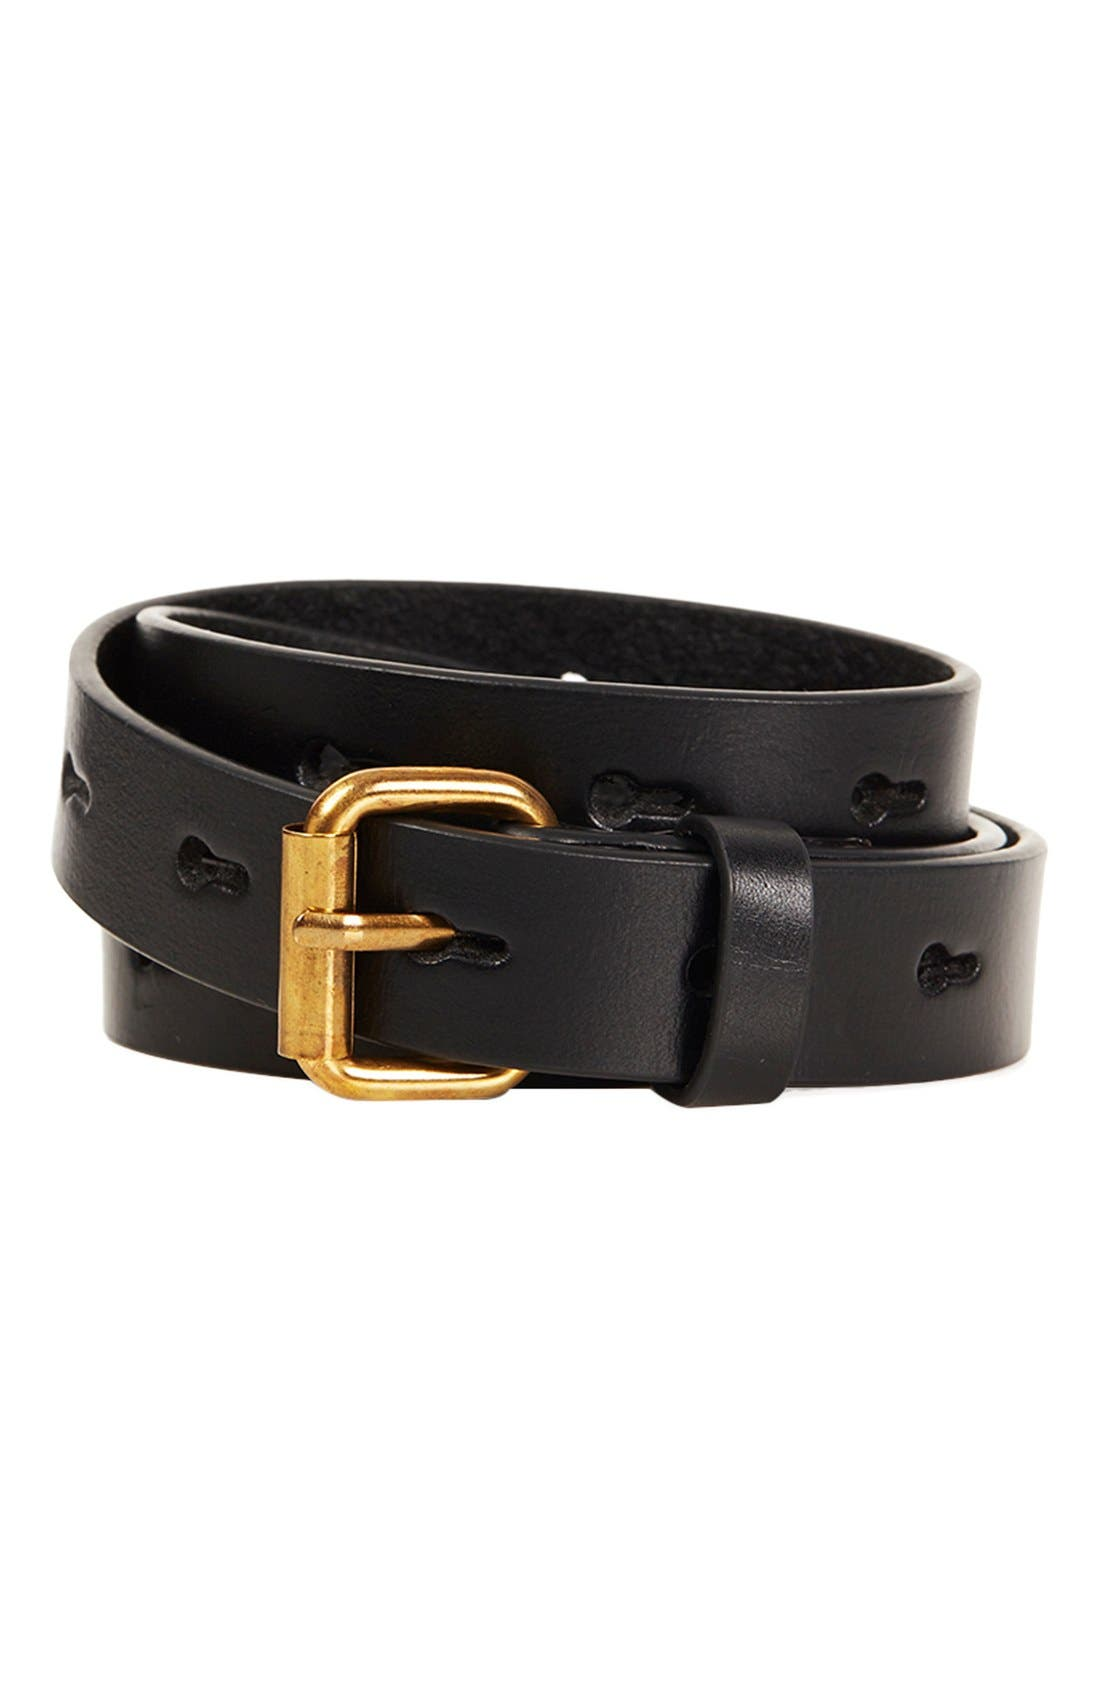 Main Image - Topshop Hole Punch Leather Belt